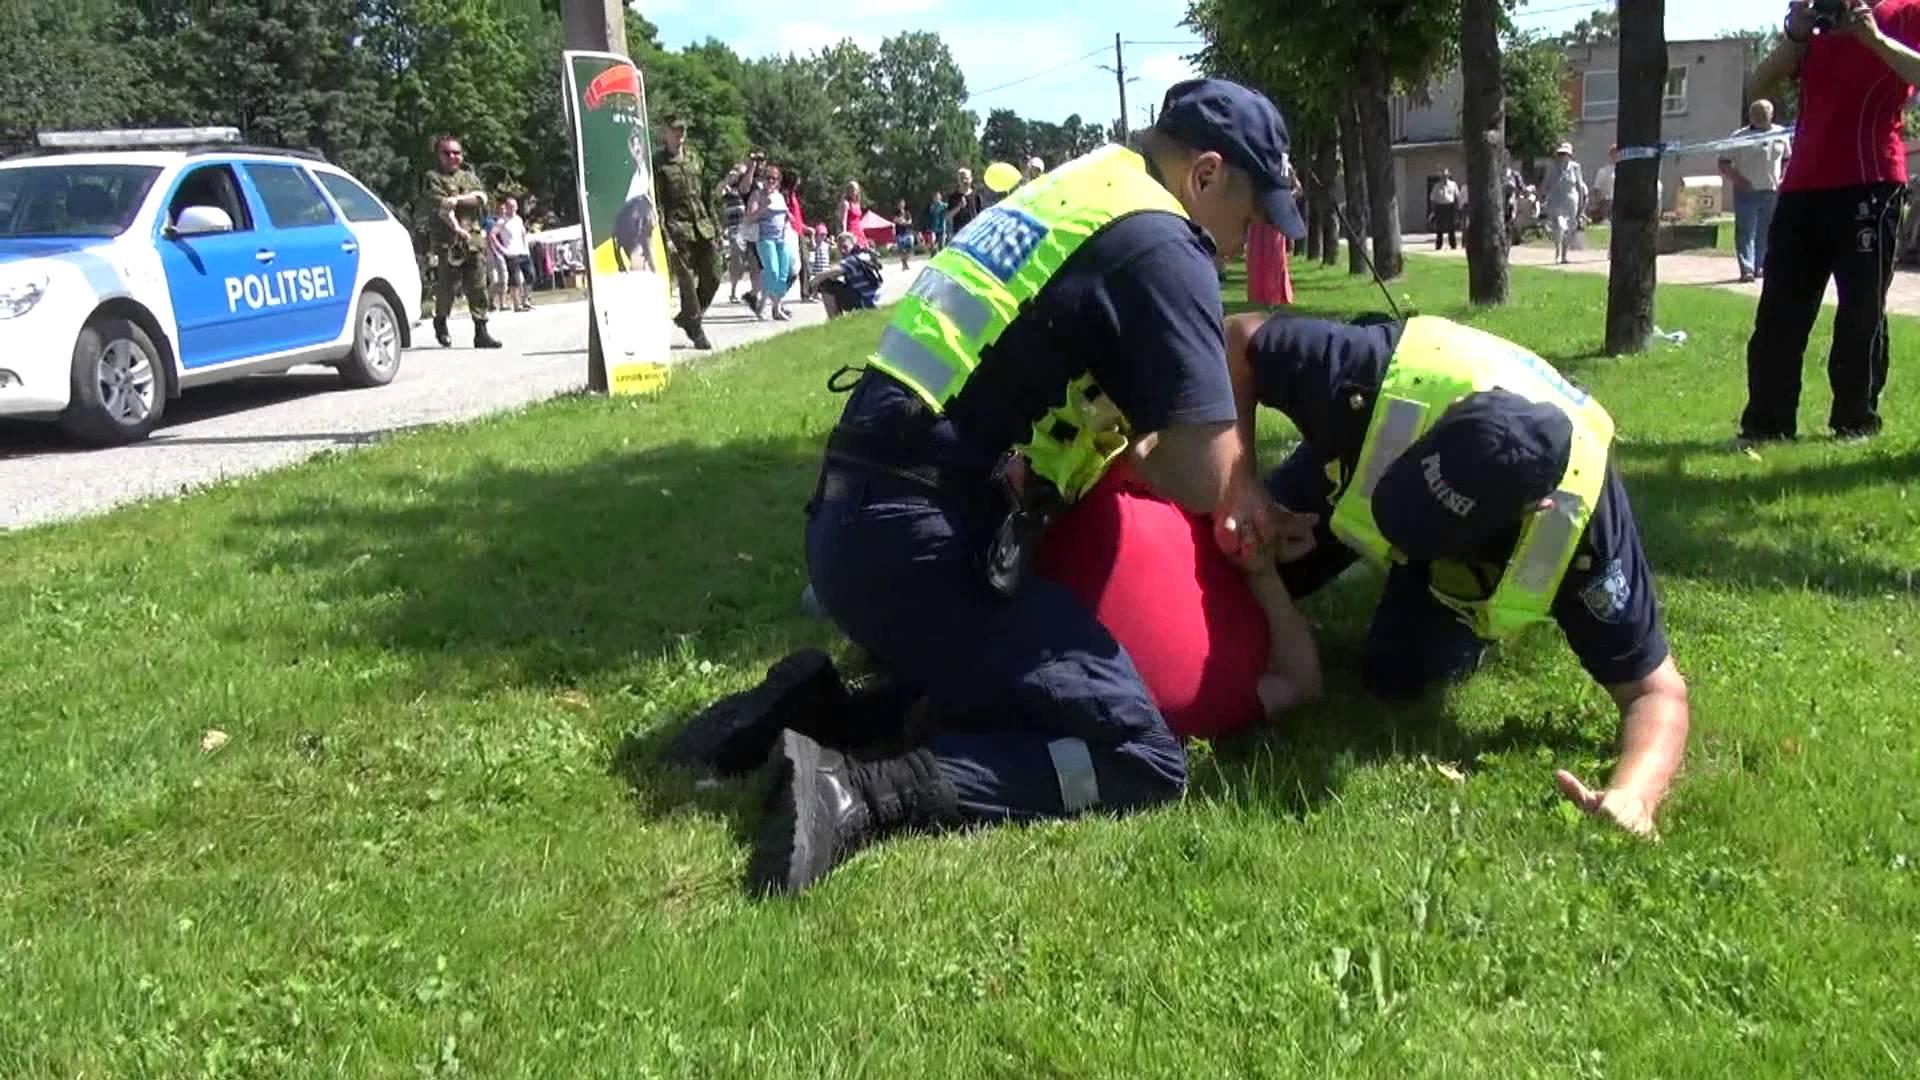 VIDEO: Eesti politsei action - Värdjad raisk, olete kõik homme vallandatud